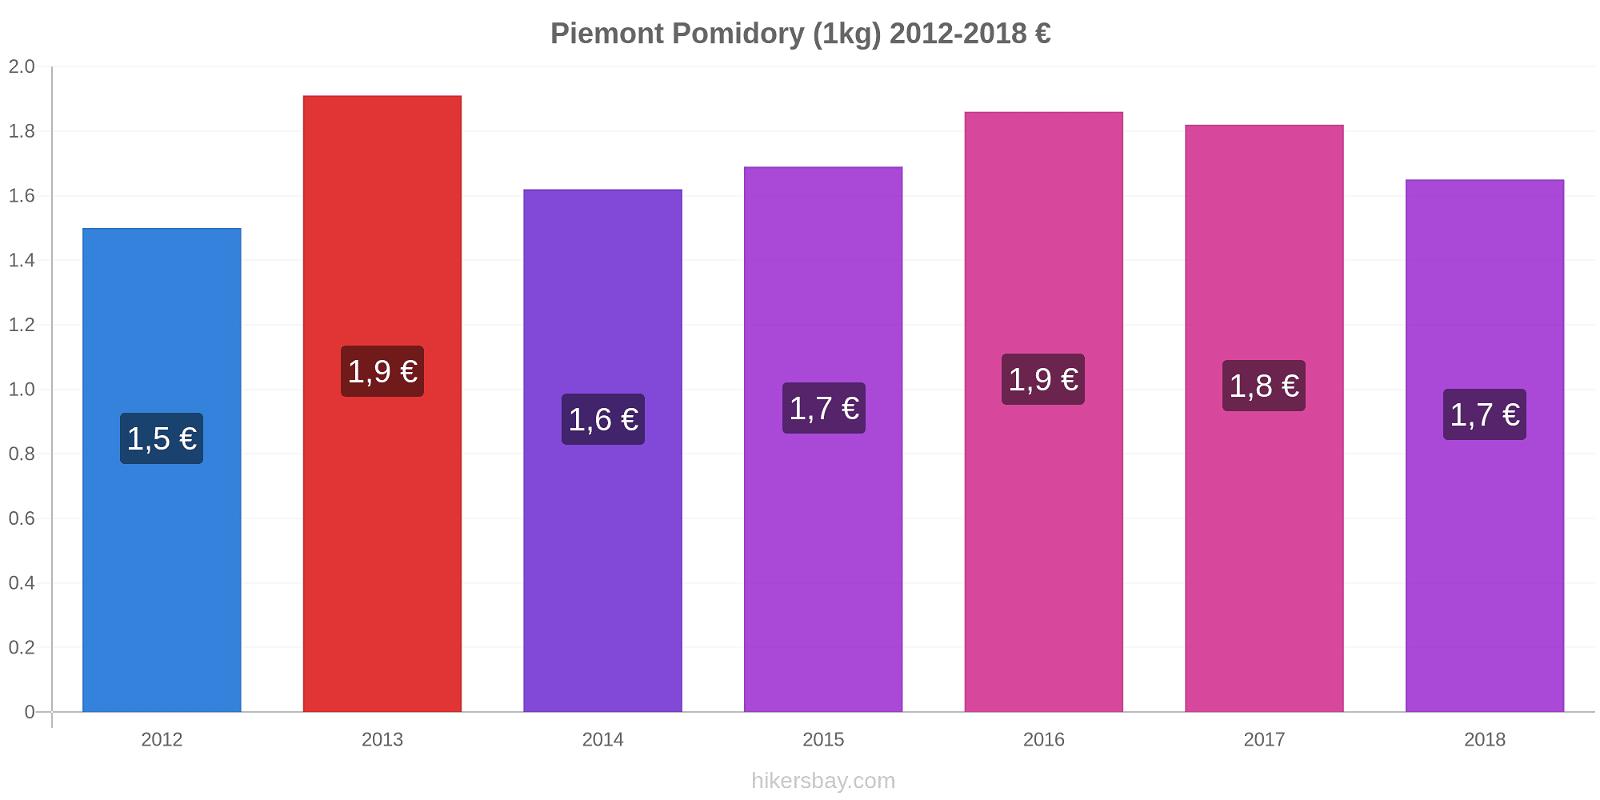 Piemont zmiany cen Pomidory (1kg) hikersbay.com